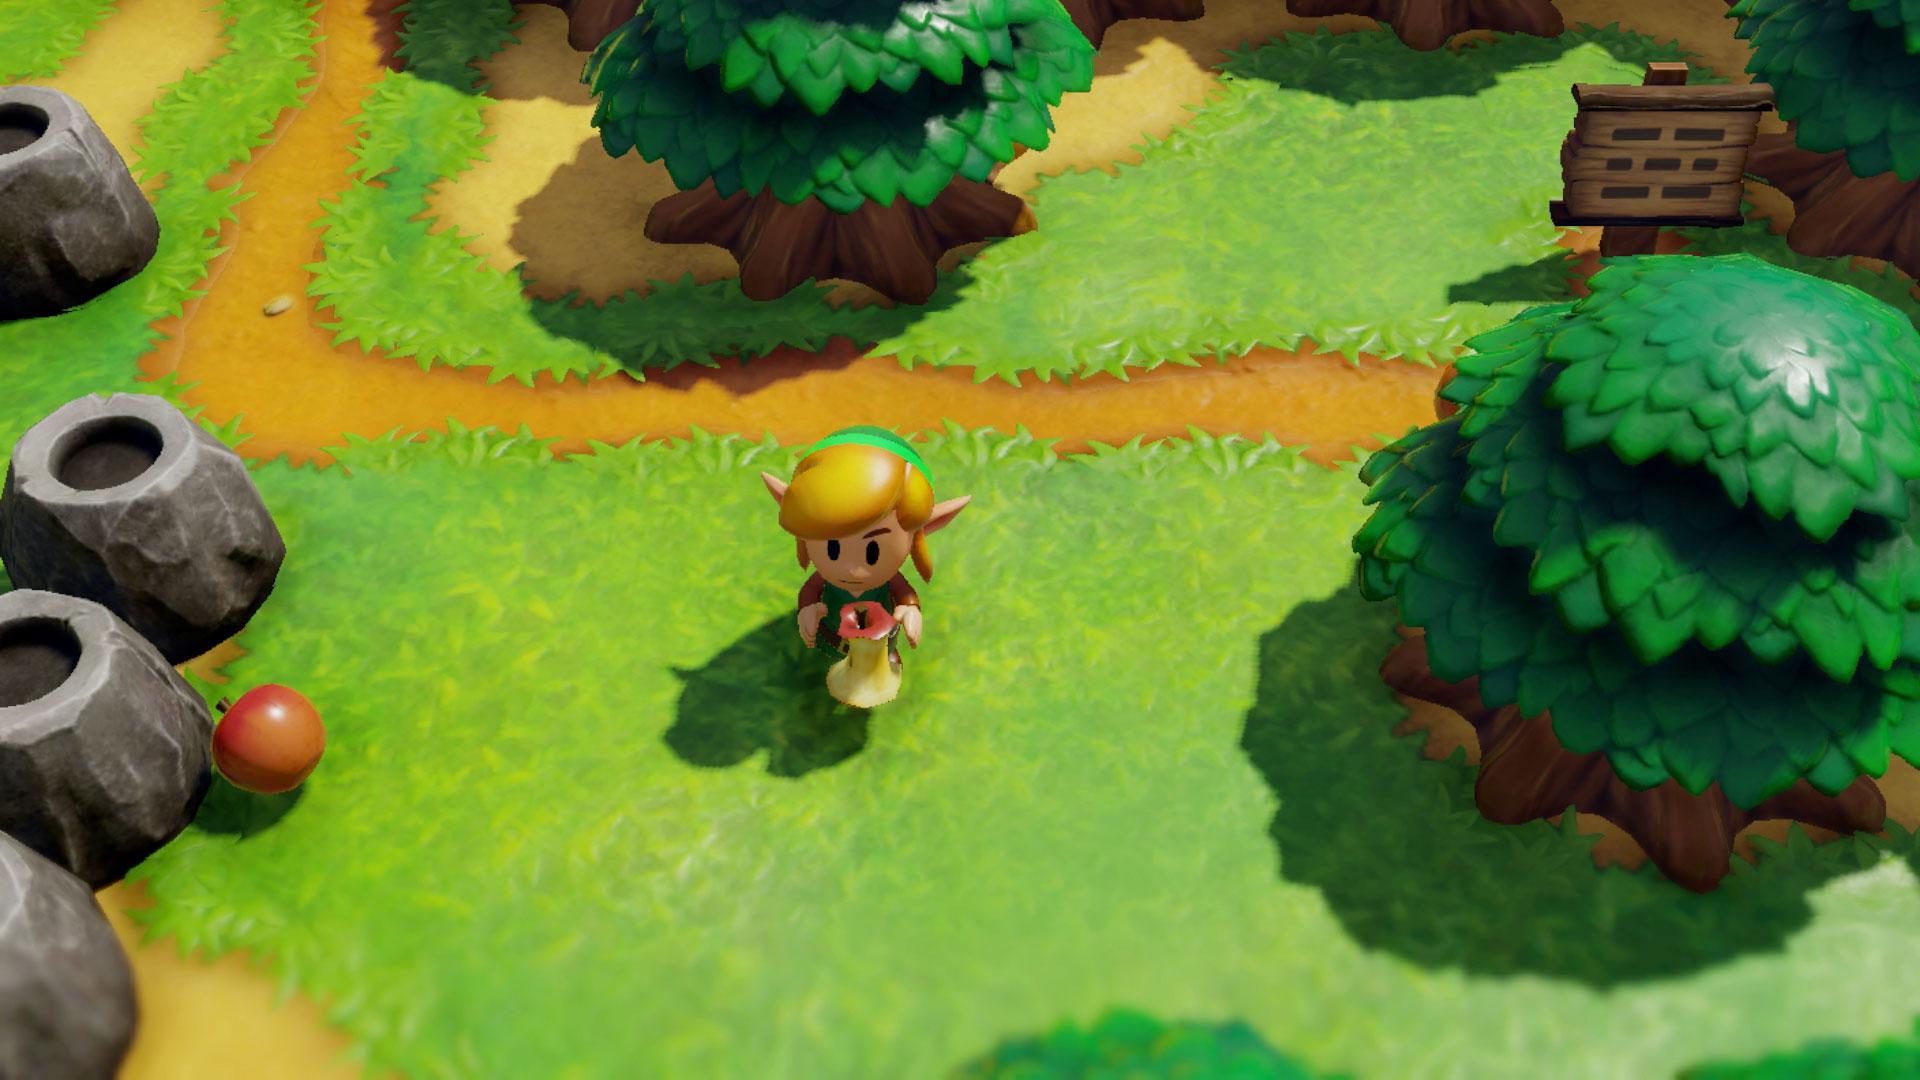 Link's Awakening fans are butting up against the game's bullshit crane game